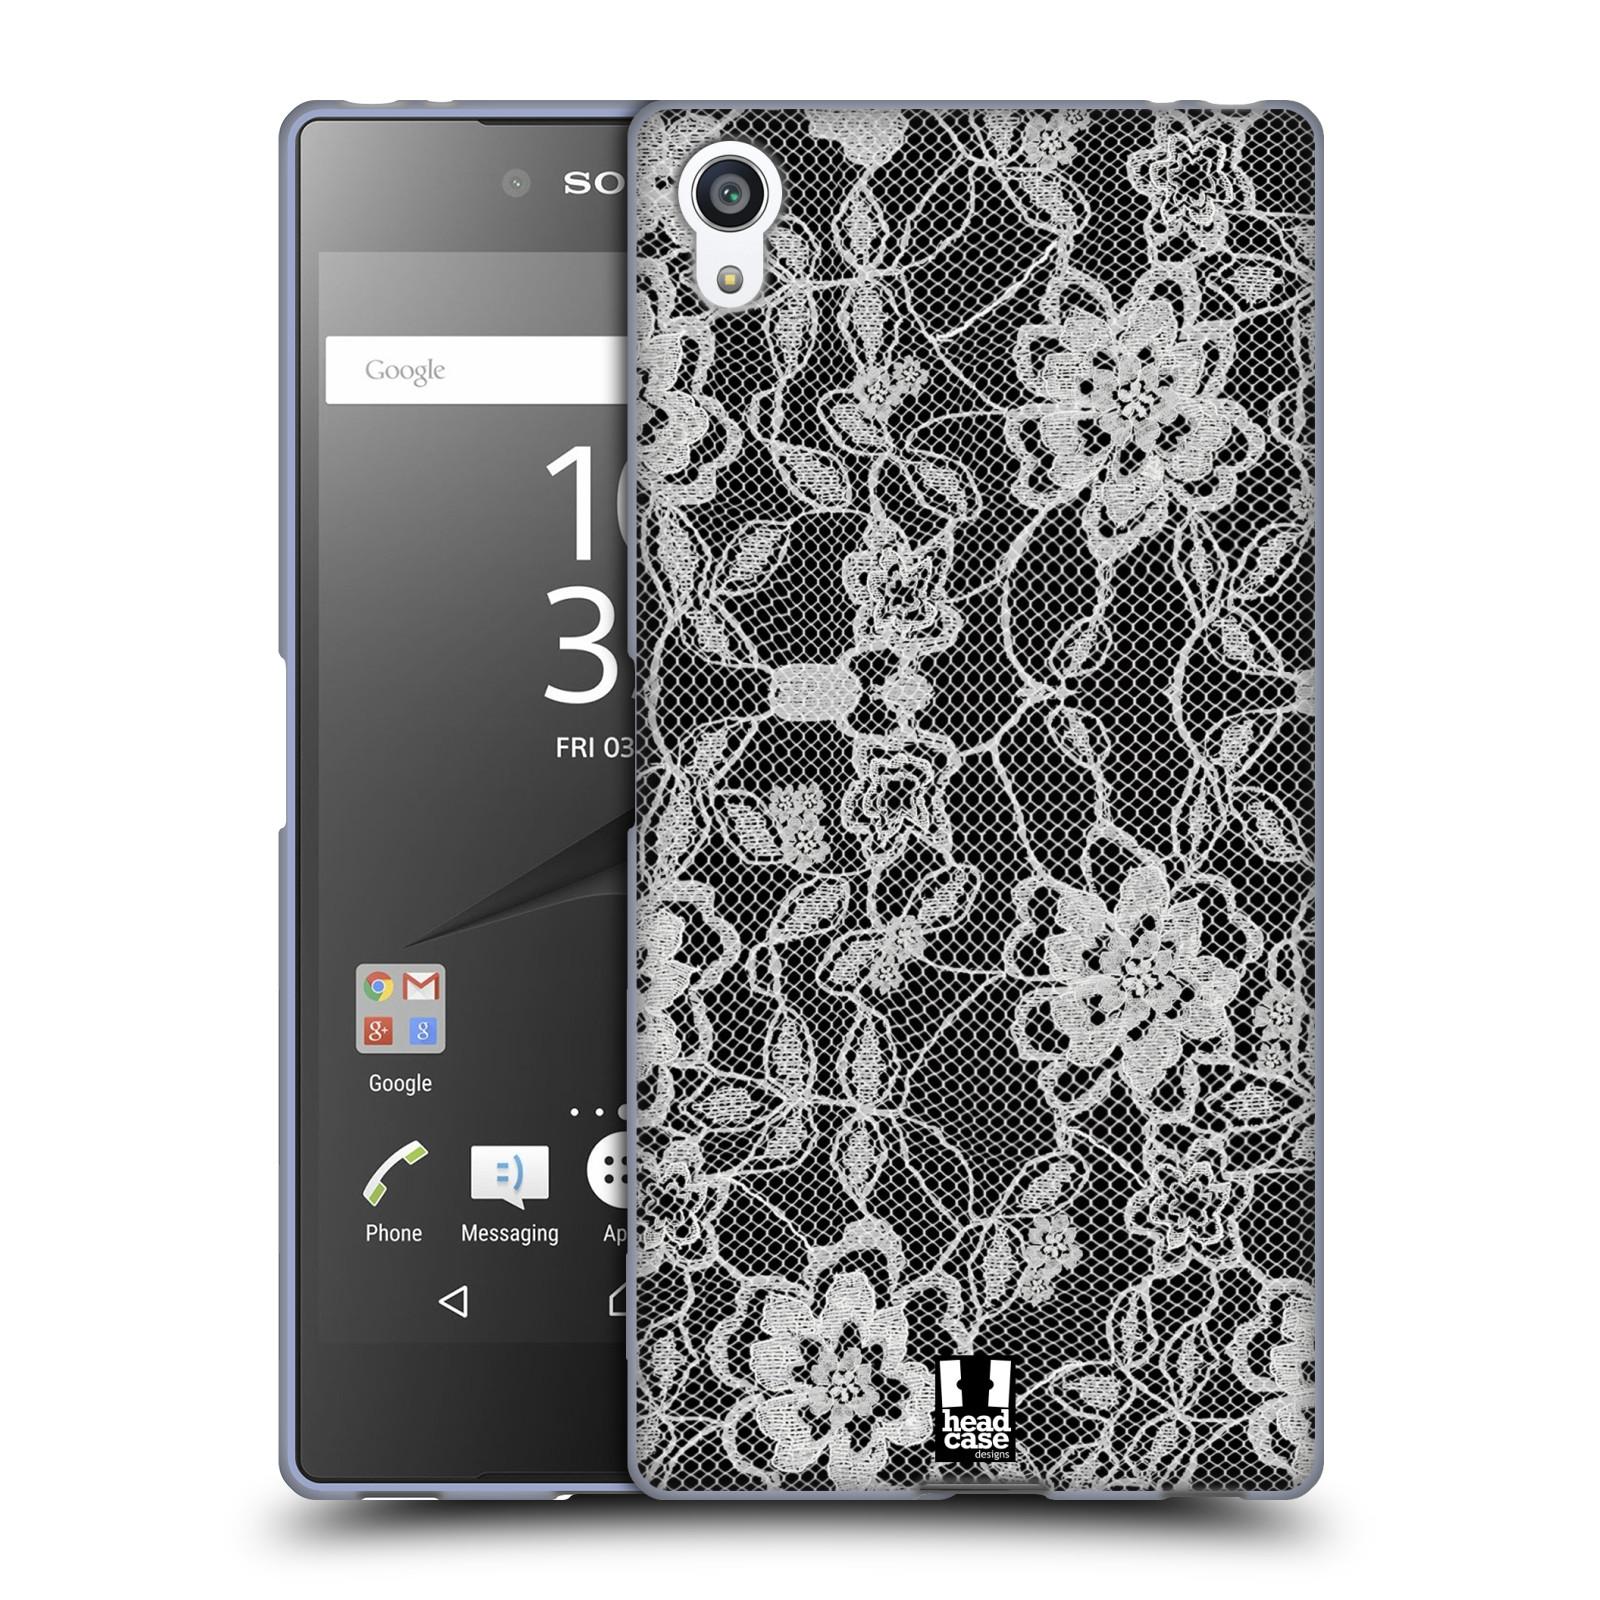 Silikonové pouzdro na mobil Sony Xperia Z5 Premium HEAD CASE FLOWERY KRAJKA